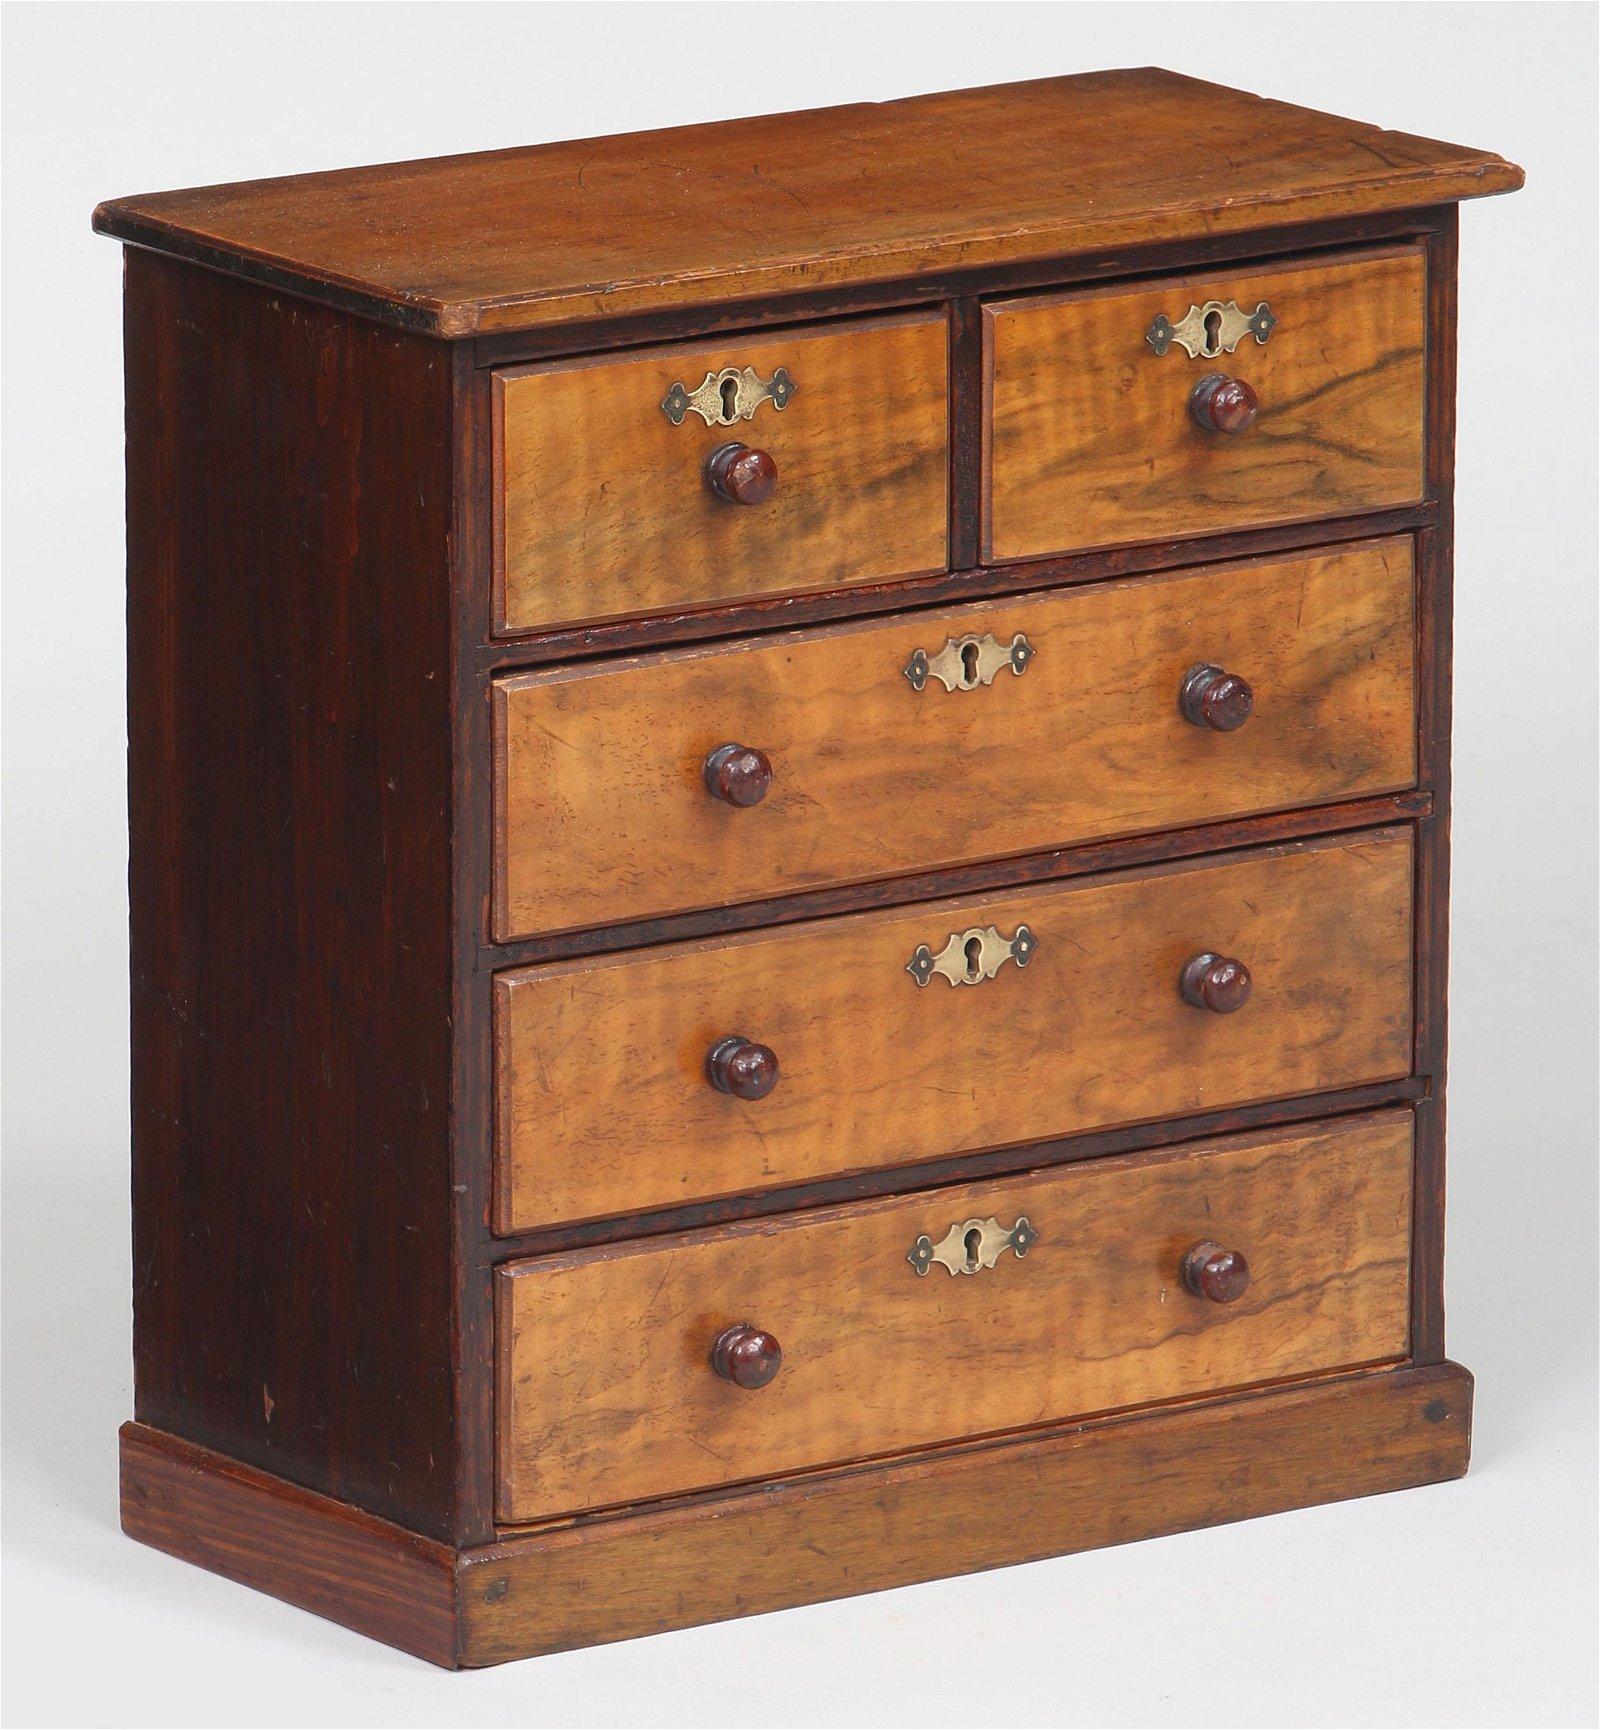 19th century miniature walnut chest